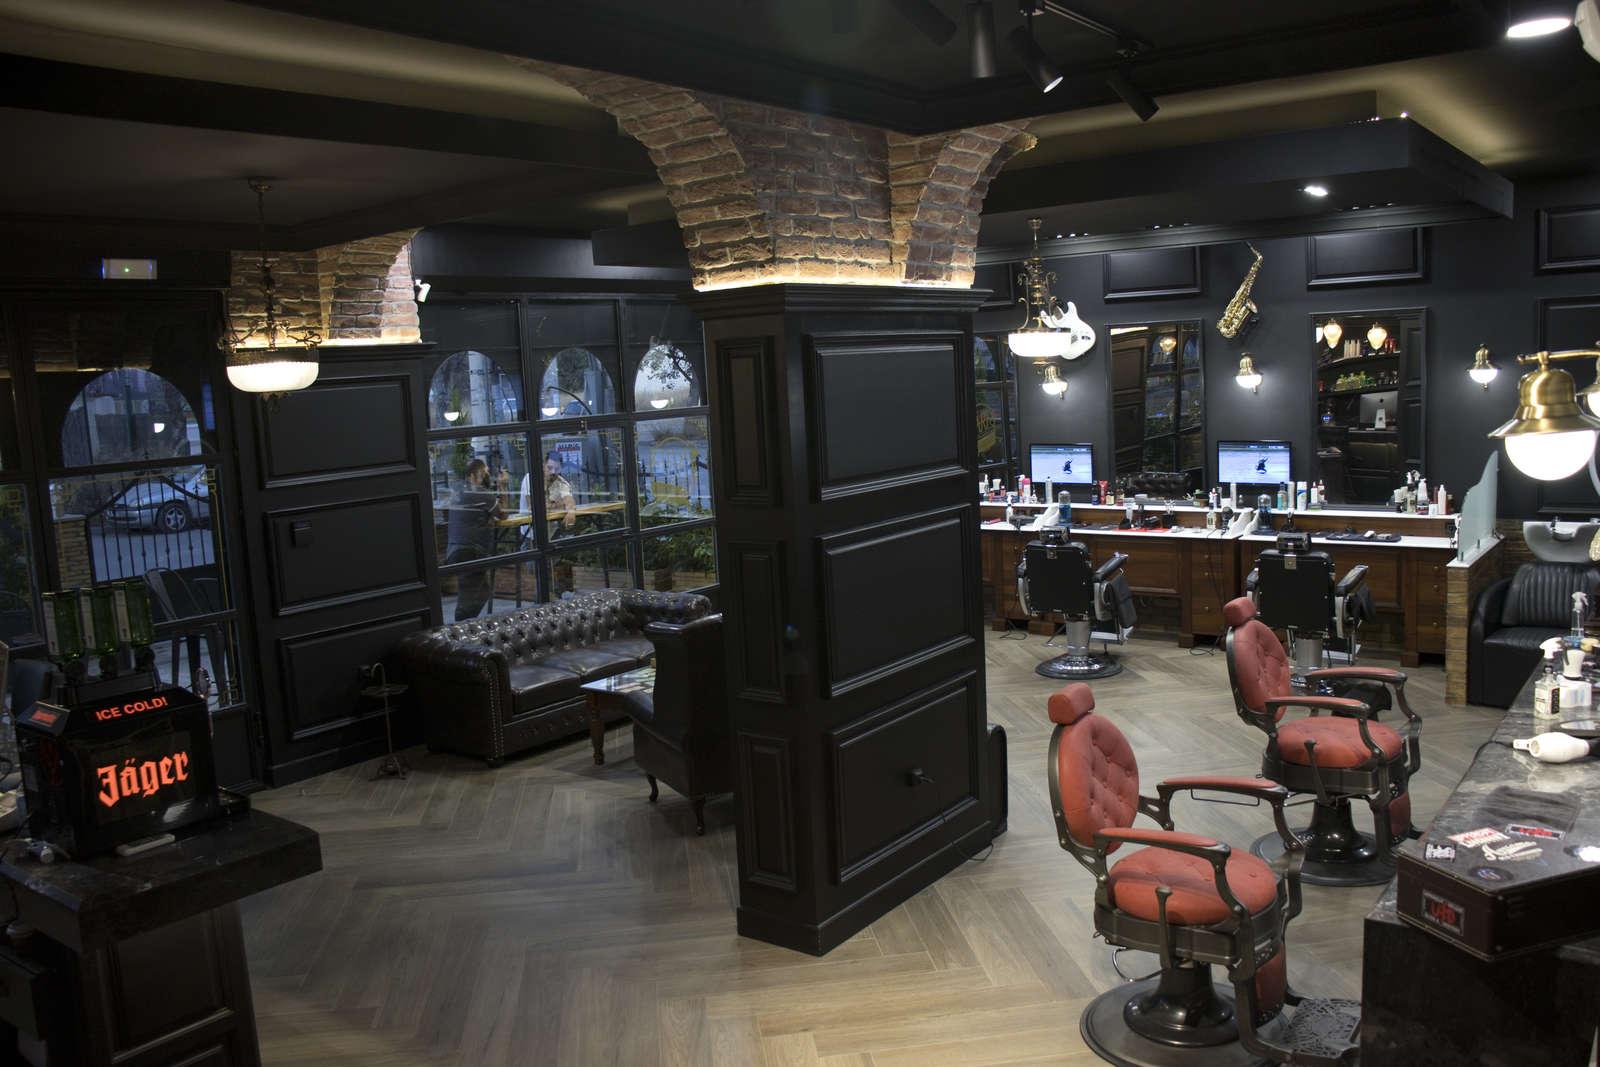 Paris Barber Shop